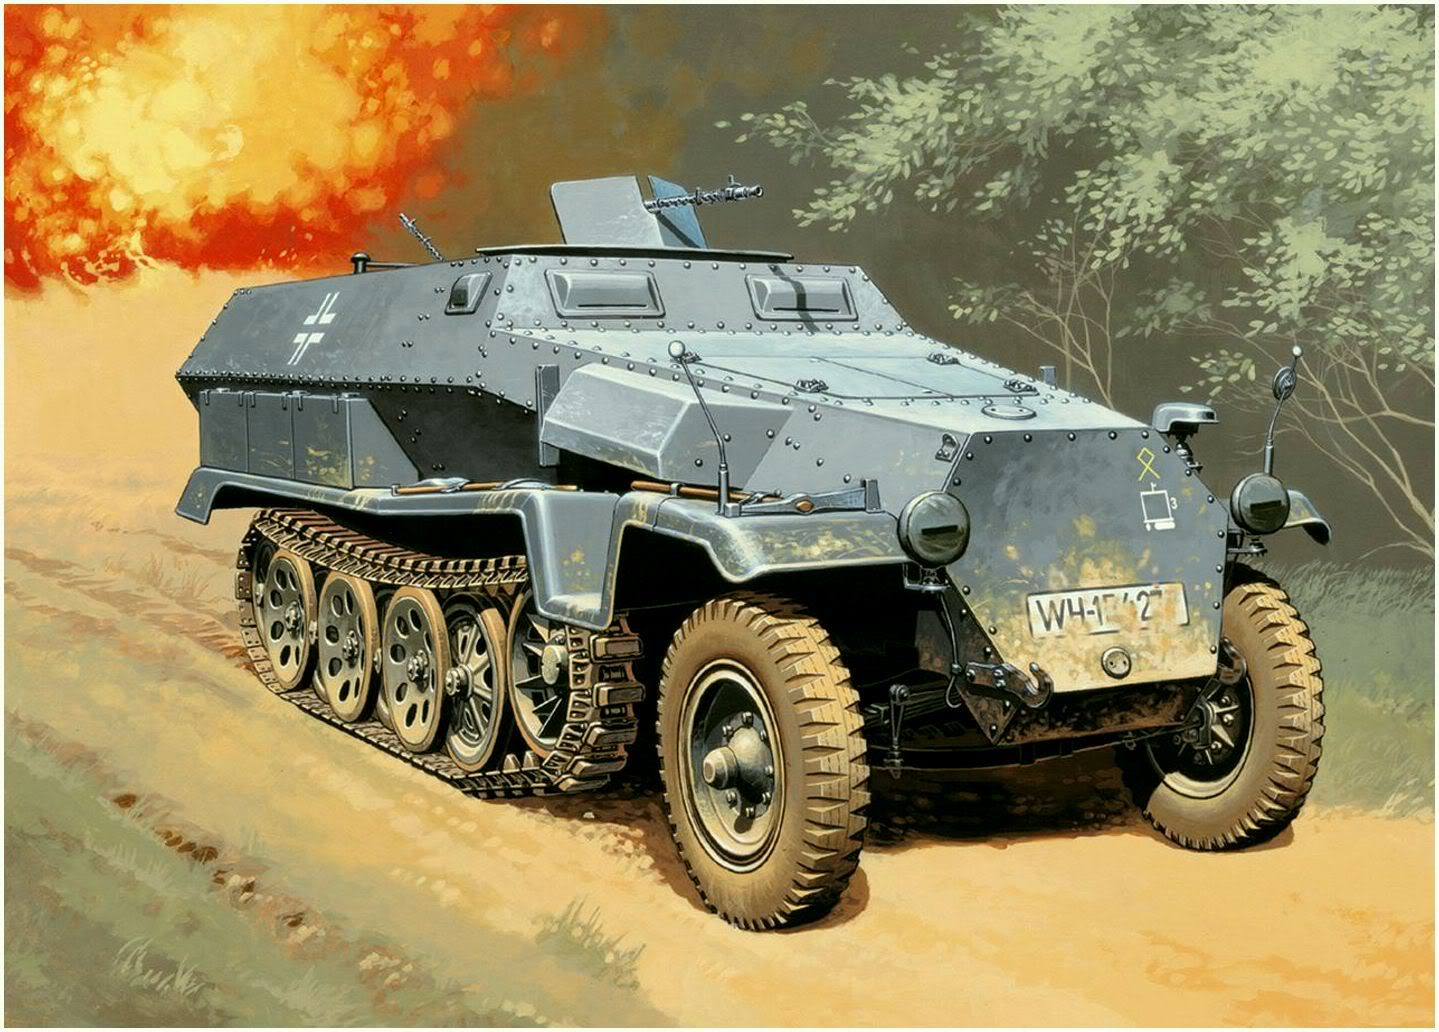 Wróbel Arkadiusz. Полугусеничный бронетранспортер Sd.Kfz. 251.